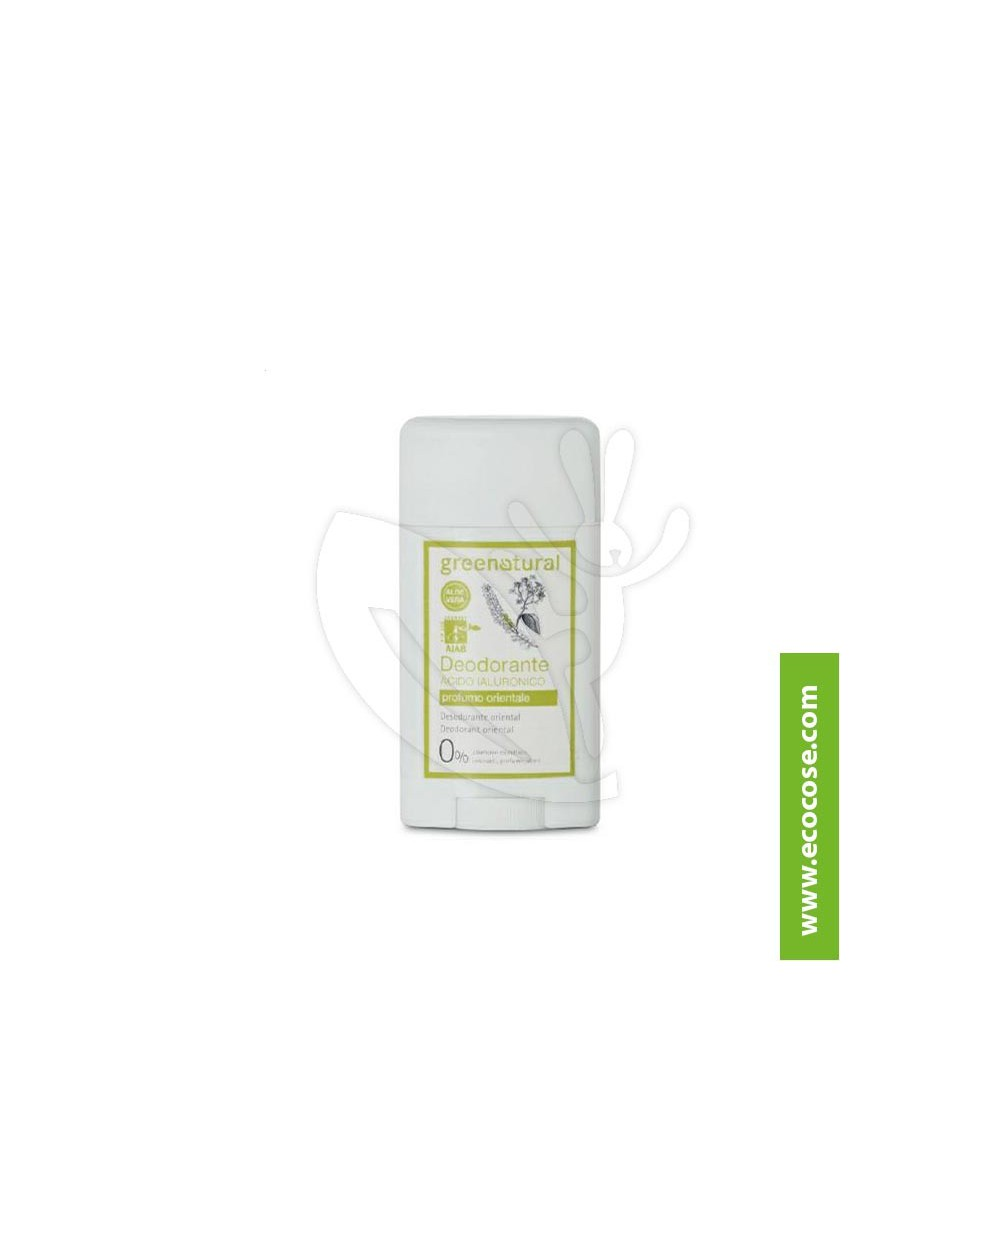 Greenatural - Deodorante stick in gel Acido Ialuronico - Profumo Orientale